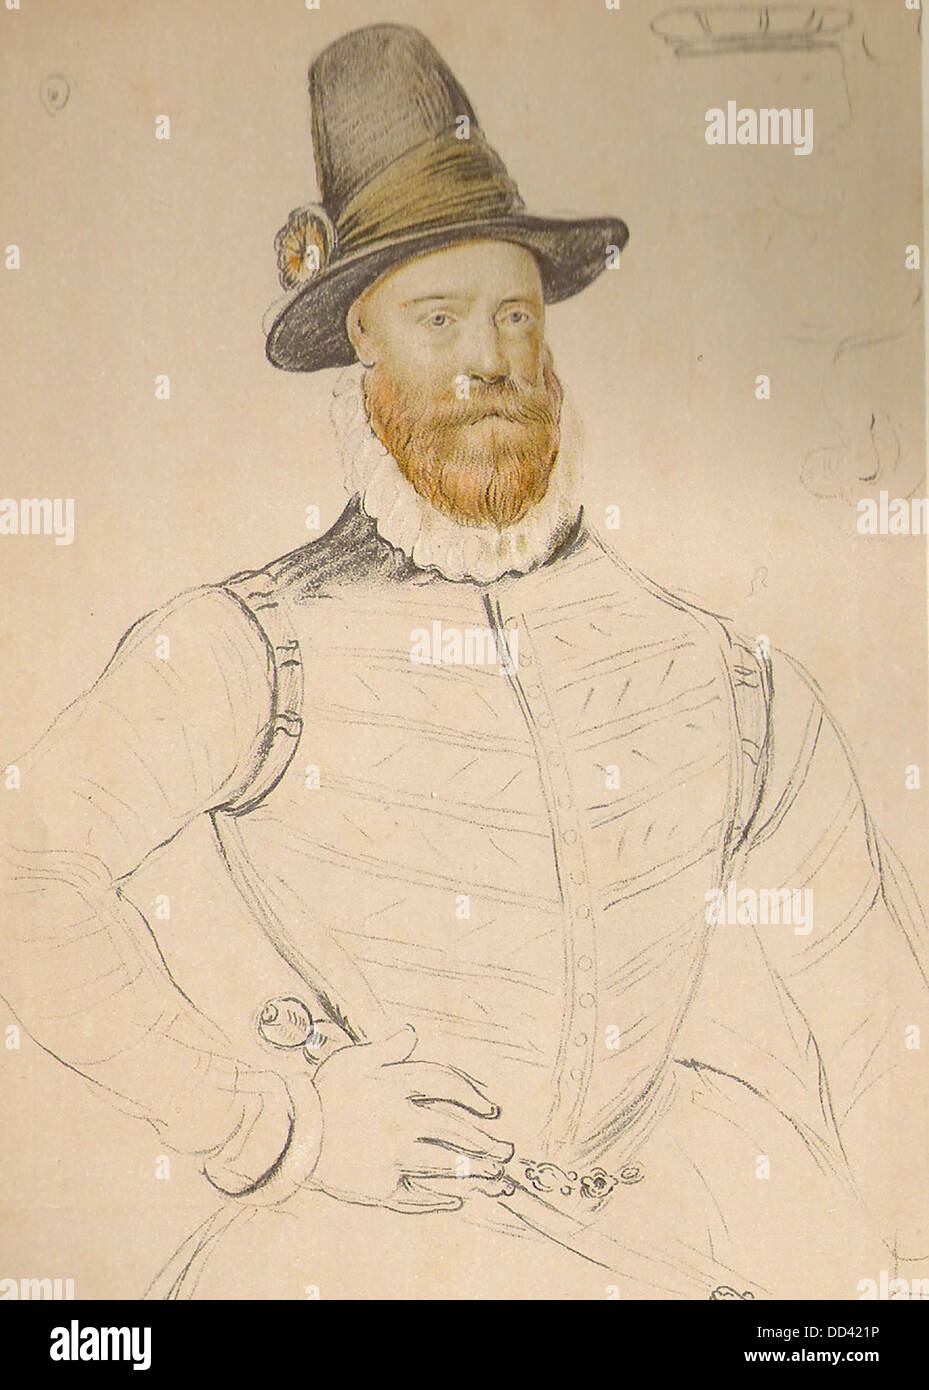 James Douglas, 4th Earl of Morton - Stock Image